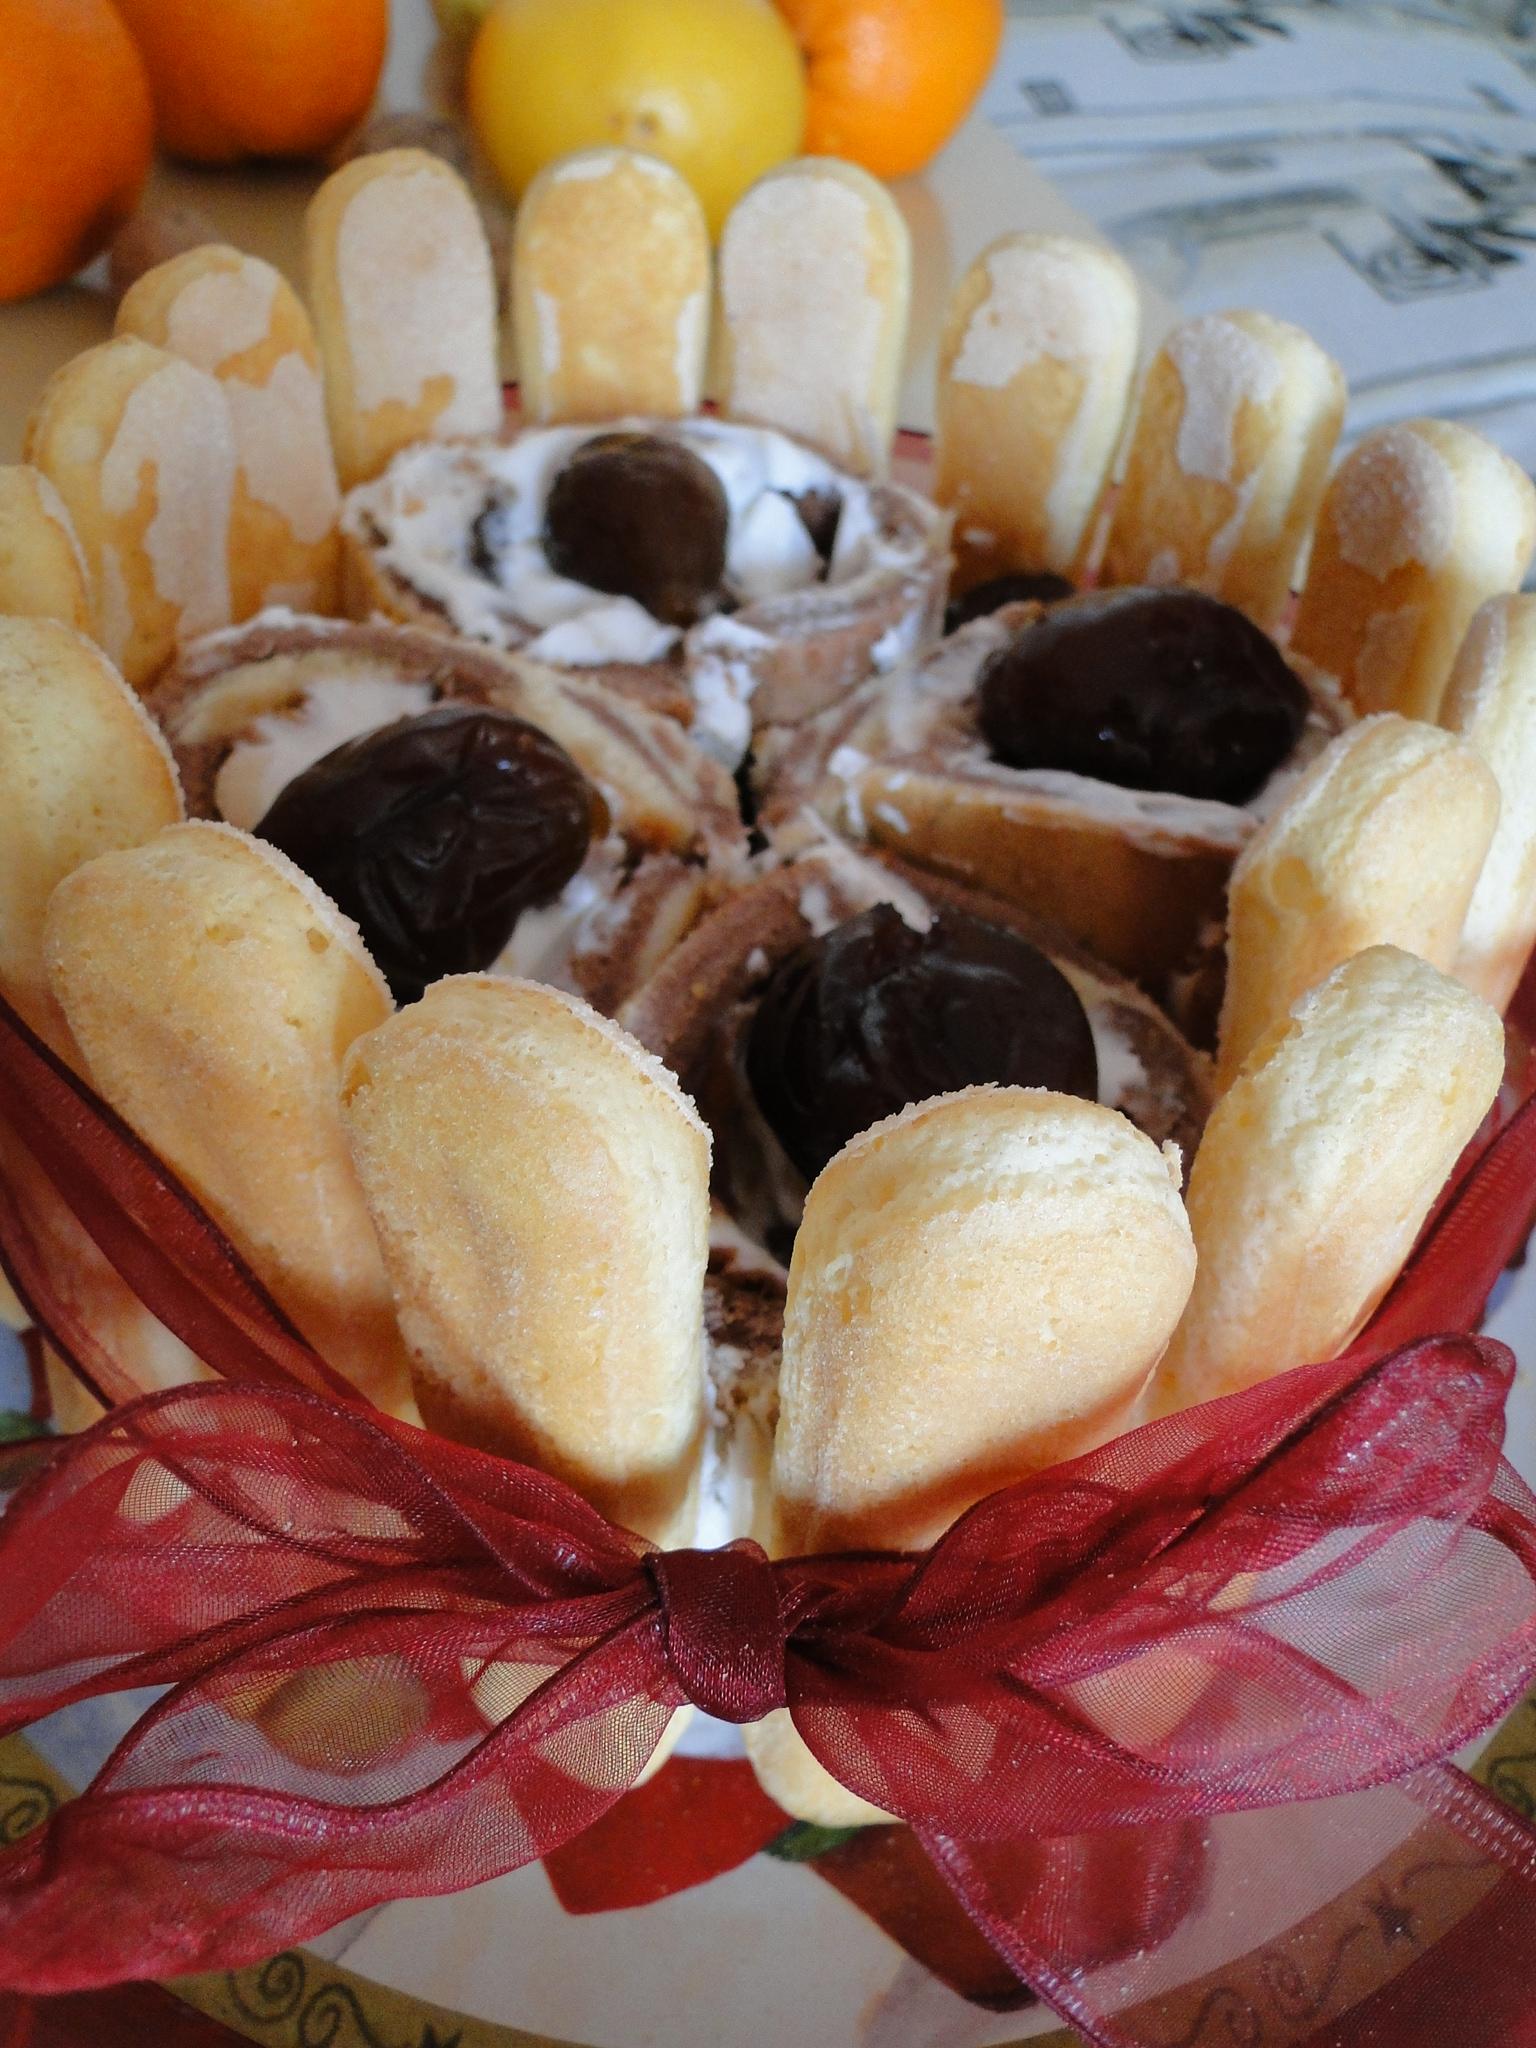 bishkotena_torta_s_pandishpanovi_rula_smokini_i_smetana